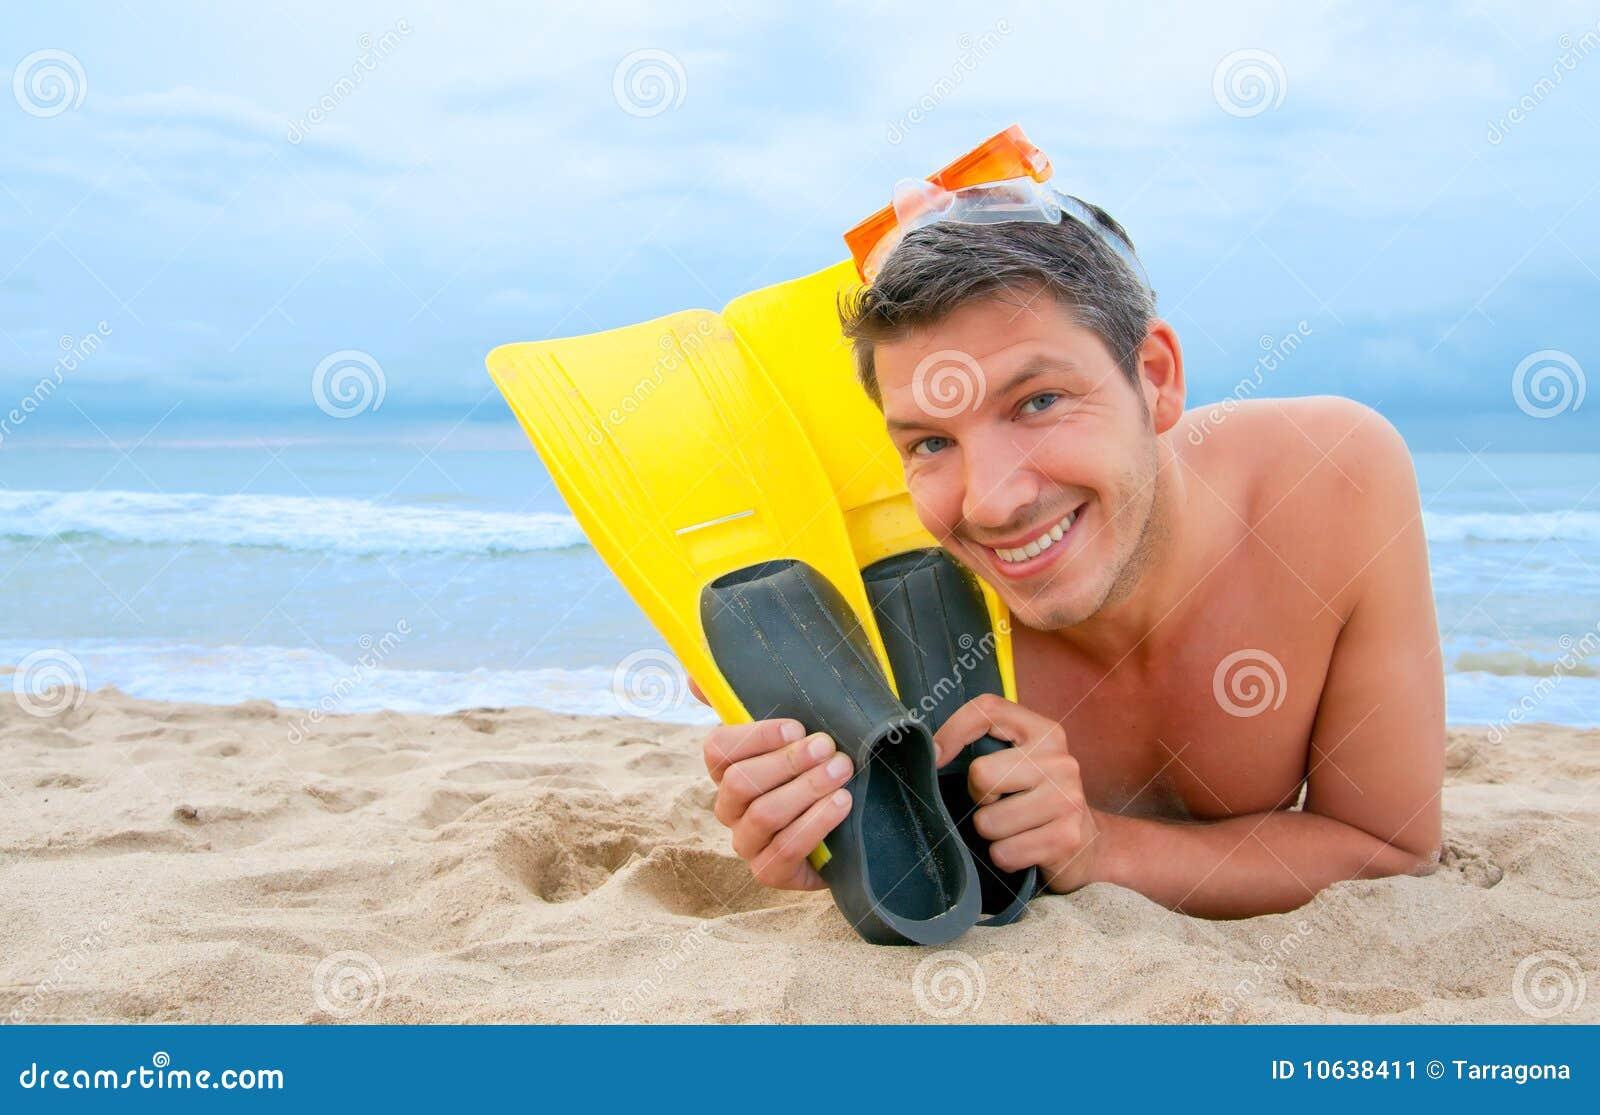 beach goggles  Beach Goggles Male Diver Stock Image - Image: 10638411